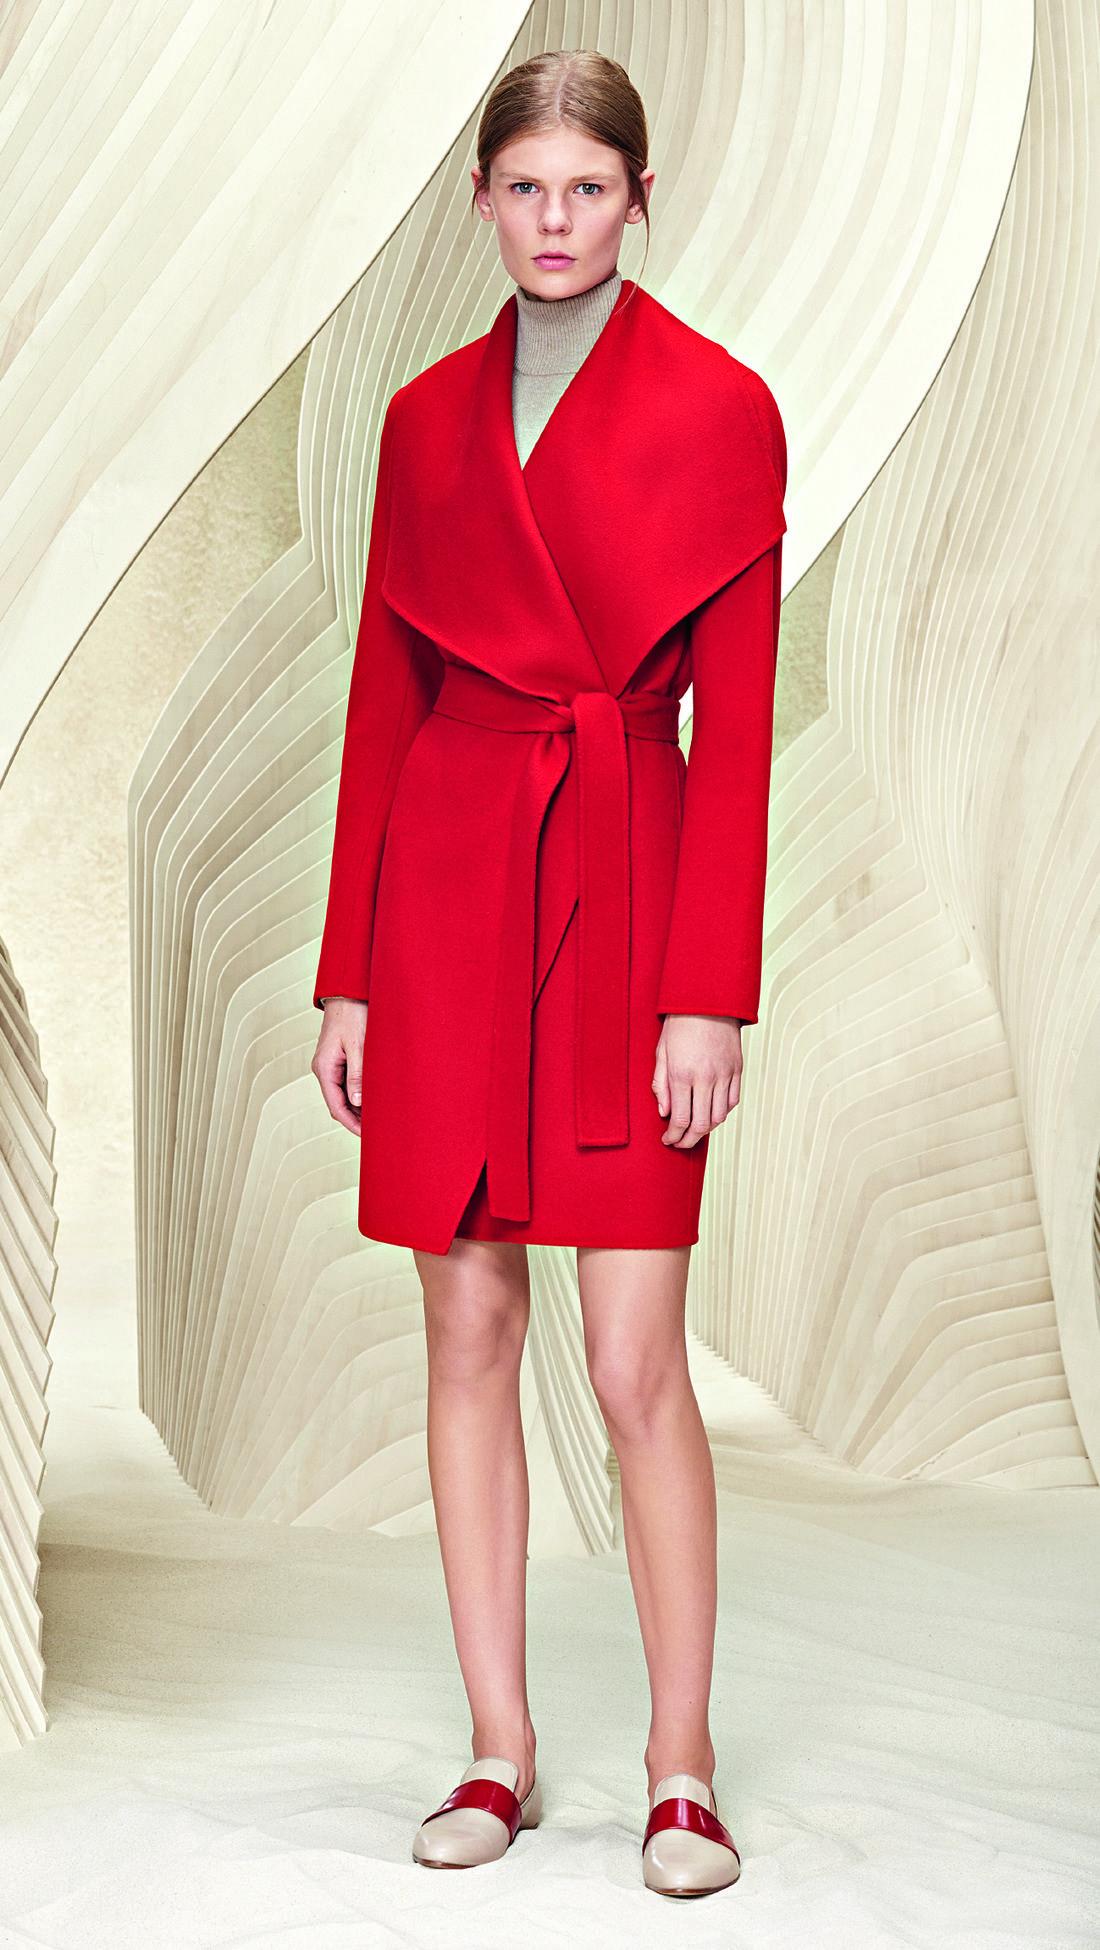 99ec425d6a0 Hugo Boss 'Catifa' shawl red wrap coat. Debuted Nov 2015. Click for more  details